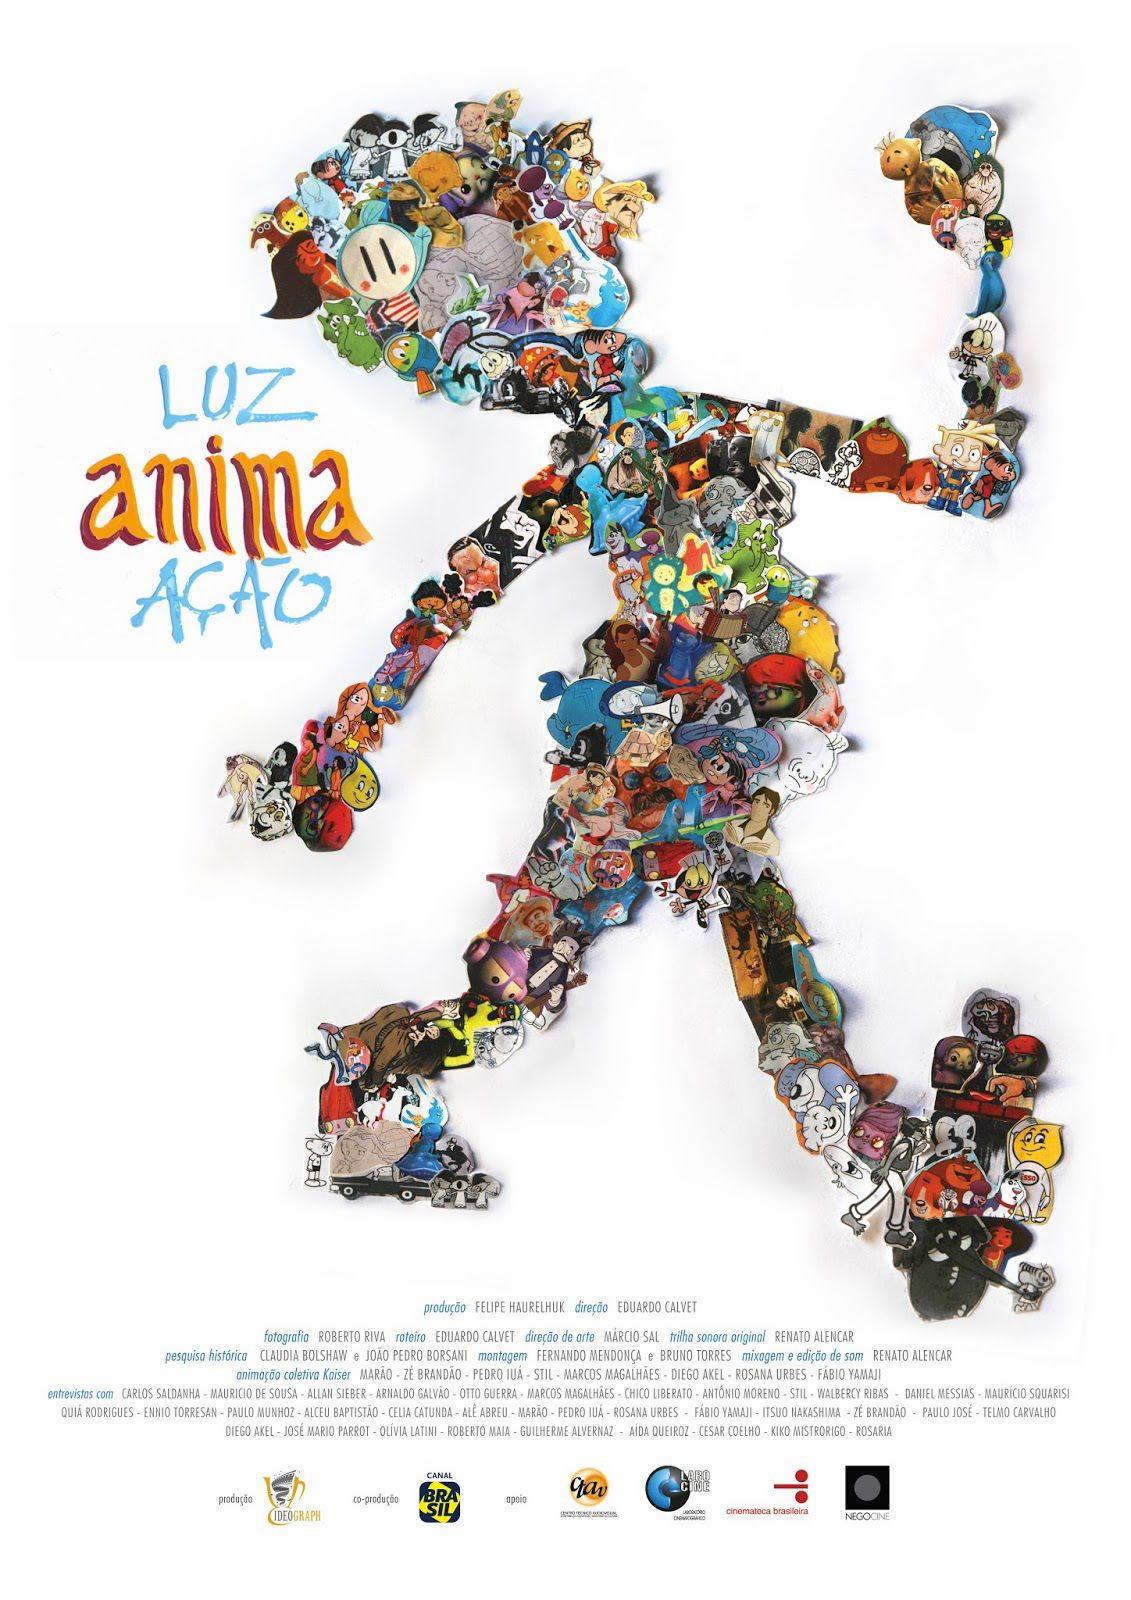 Luz Anima Açao